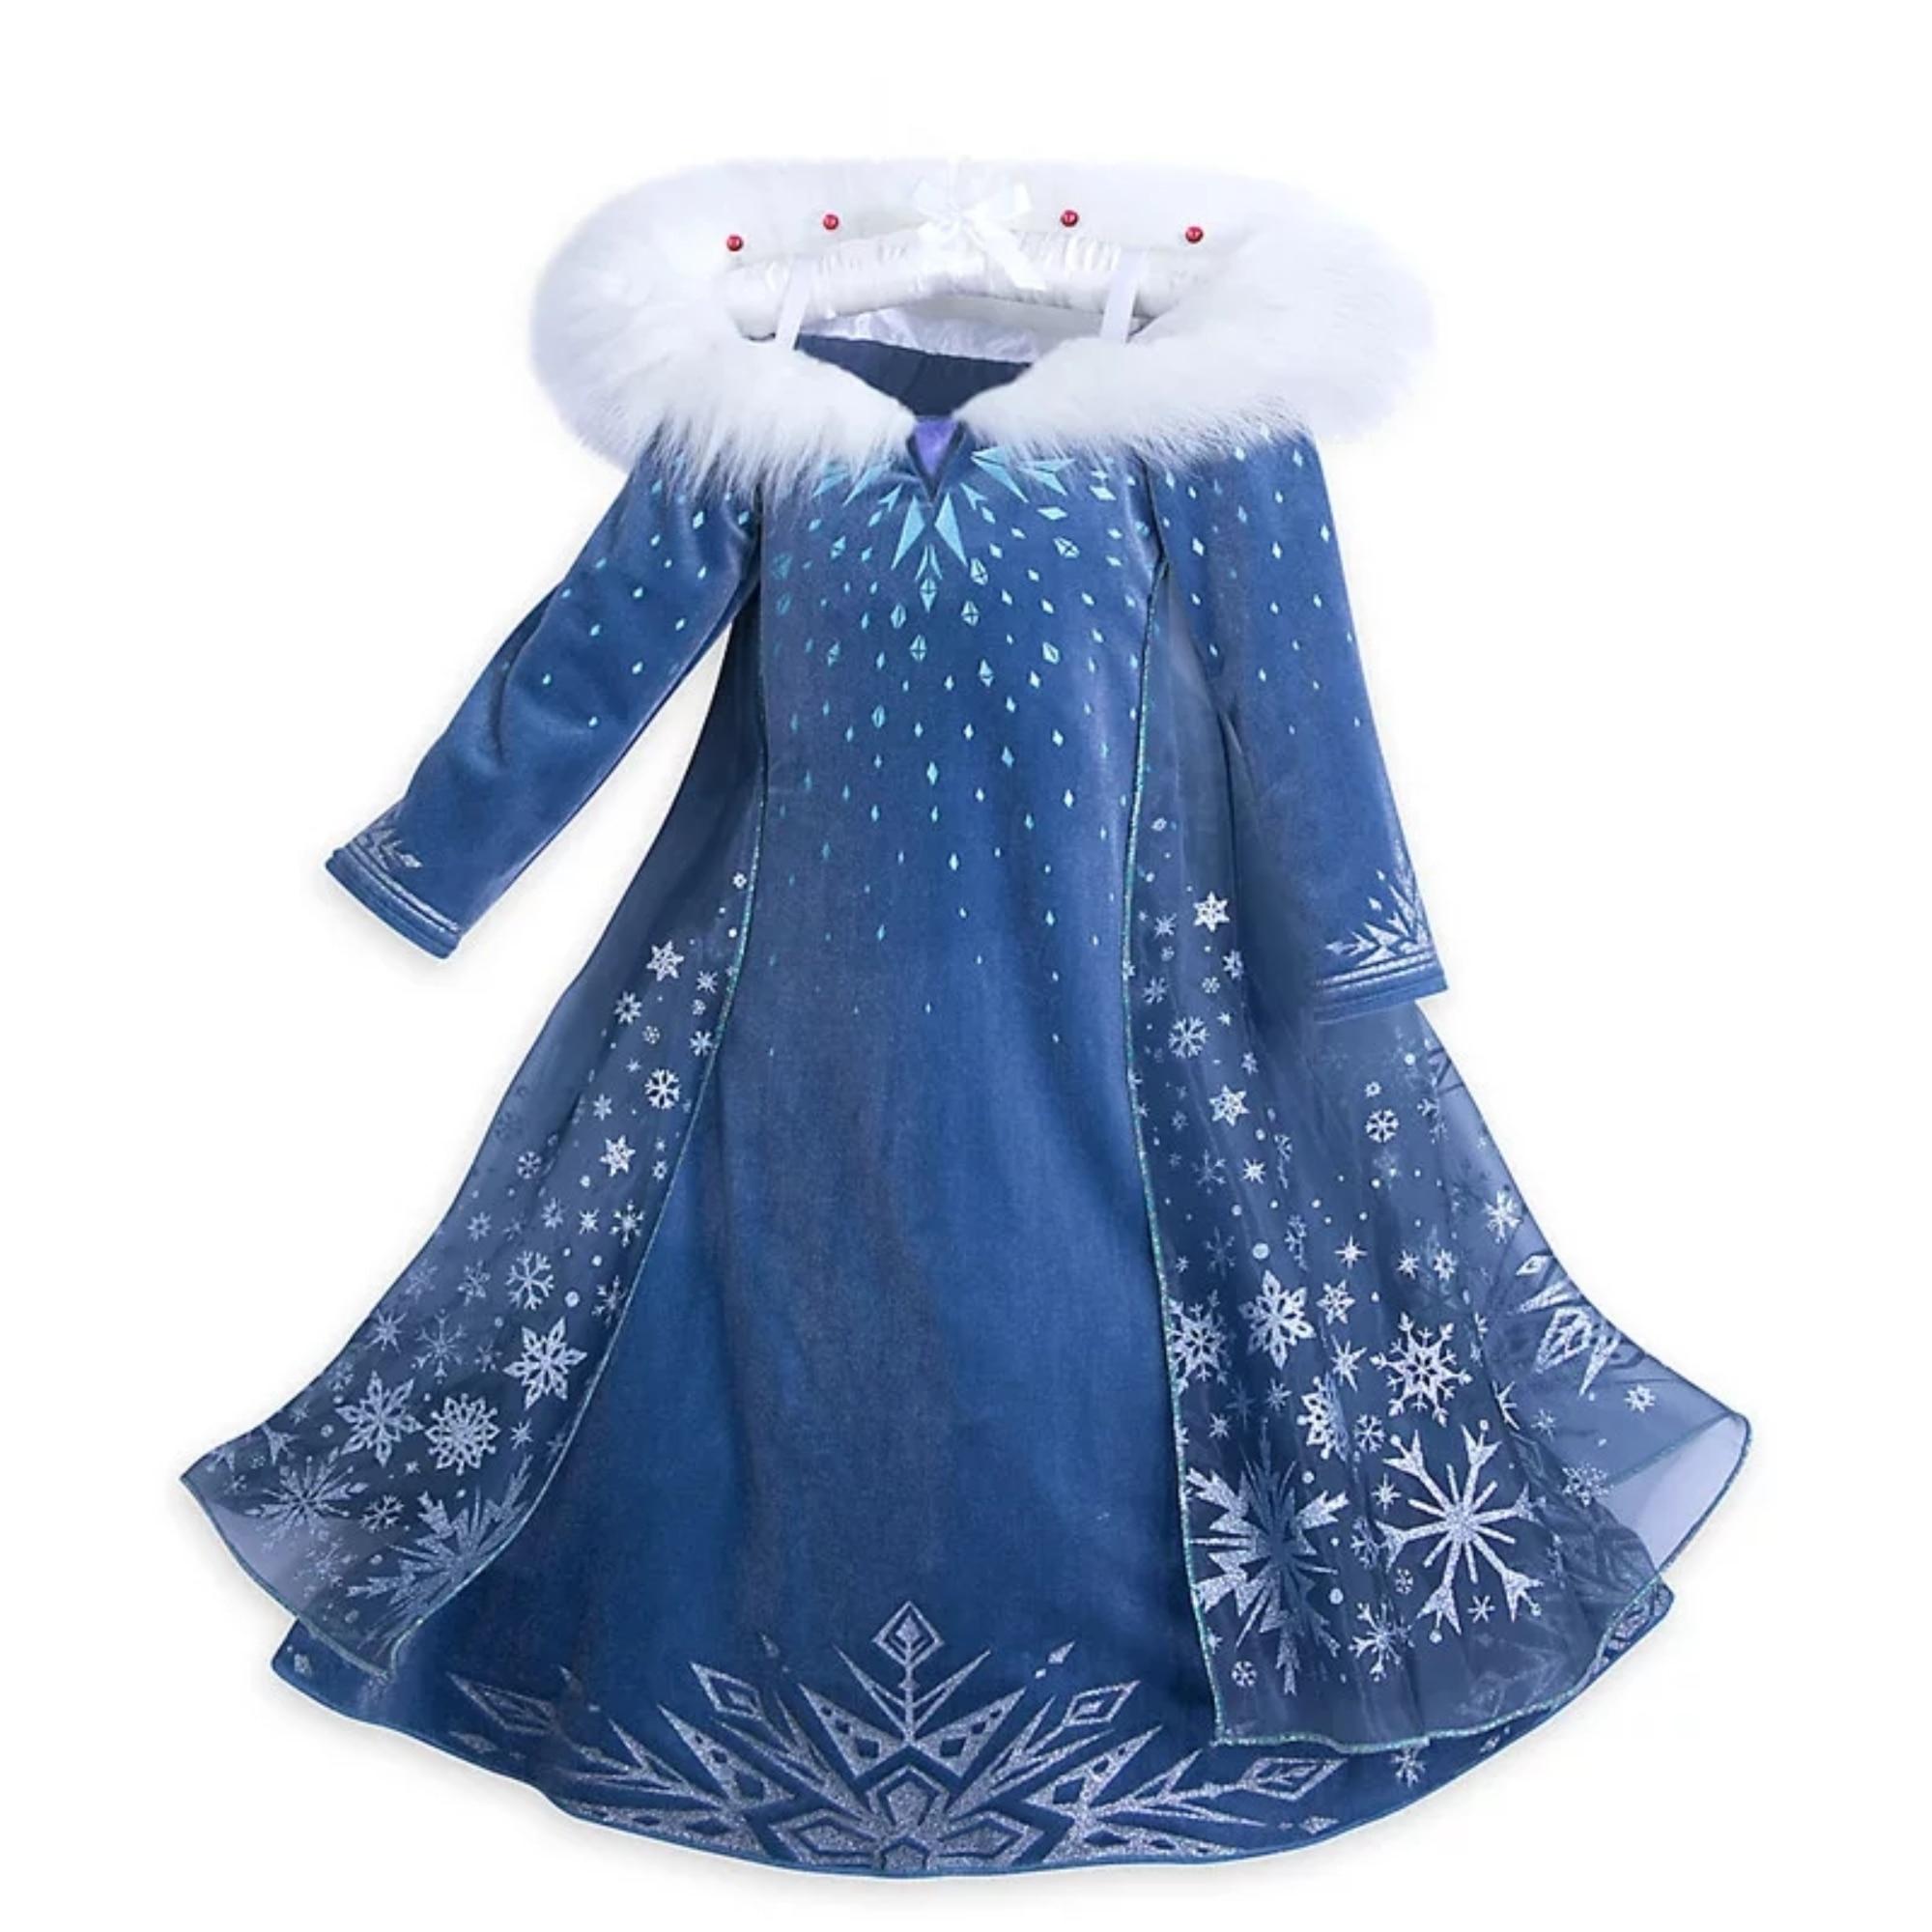 site autorizat selecție uimitoare data eliberării Rochie Elsa Frozen model Fulg de nea, 4 - 5 ani, Trickert - eMAG.ro